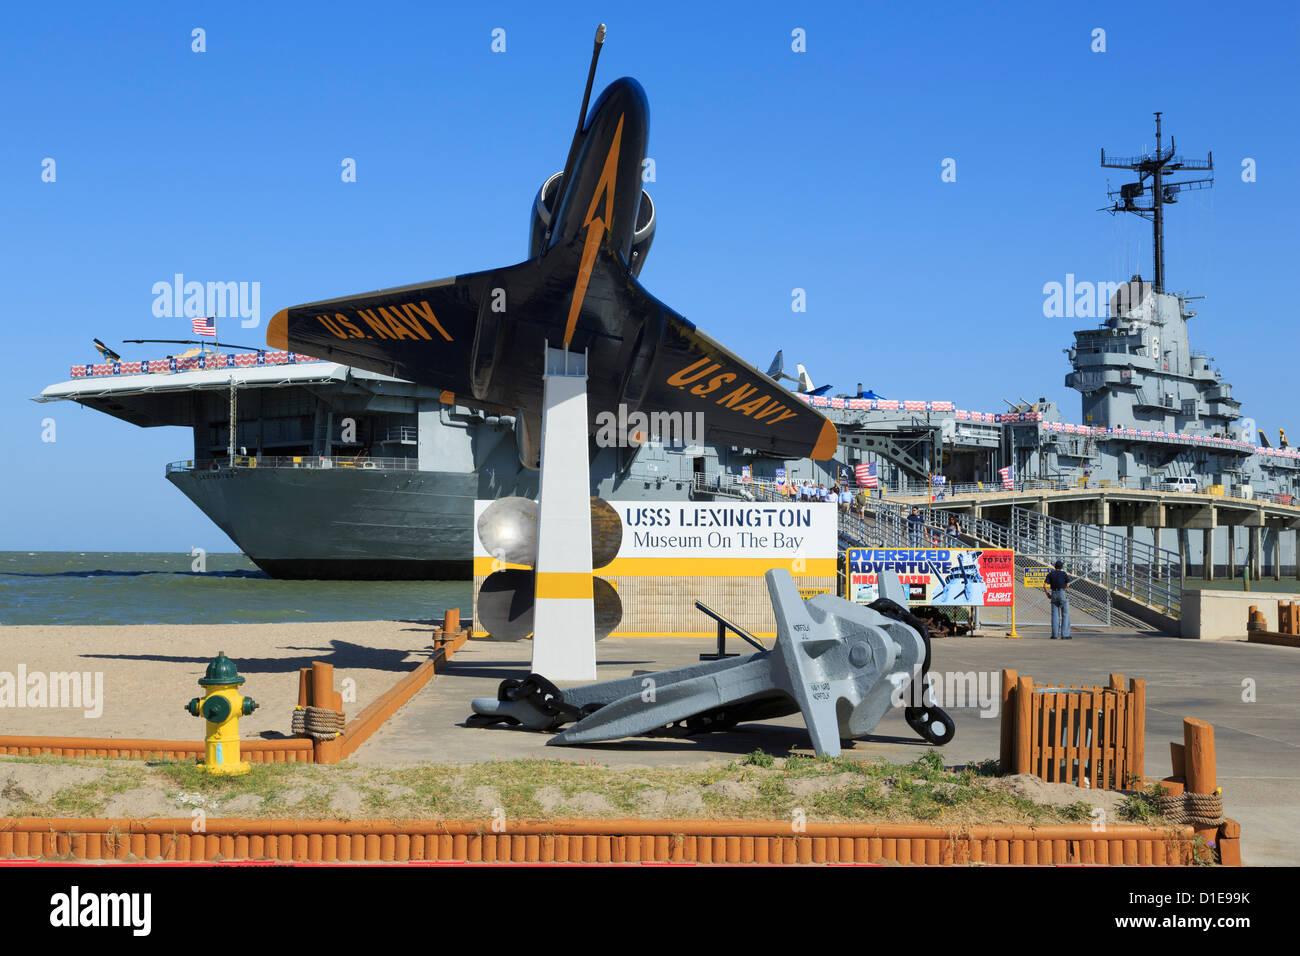 USS Lexington Museum On The Bay, North Beach, Corpus Christi, Texas, United States of America, North America - Stock Image